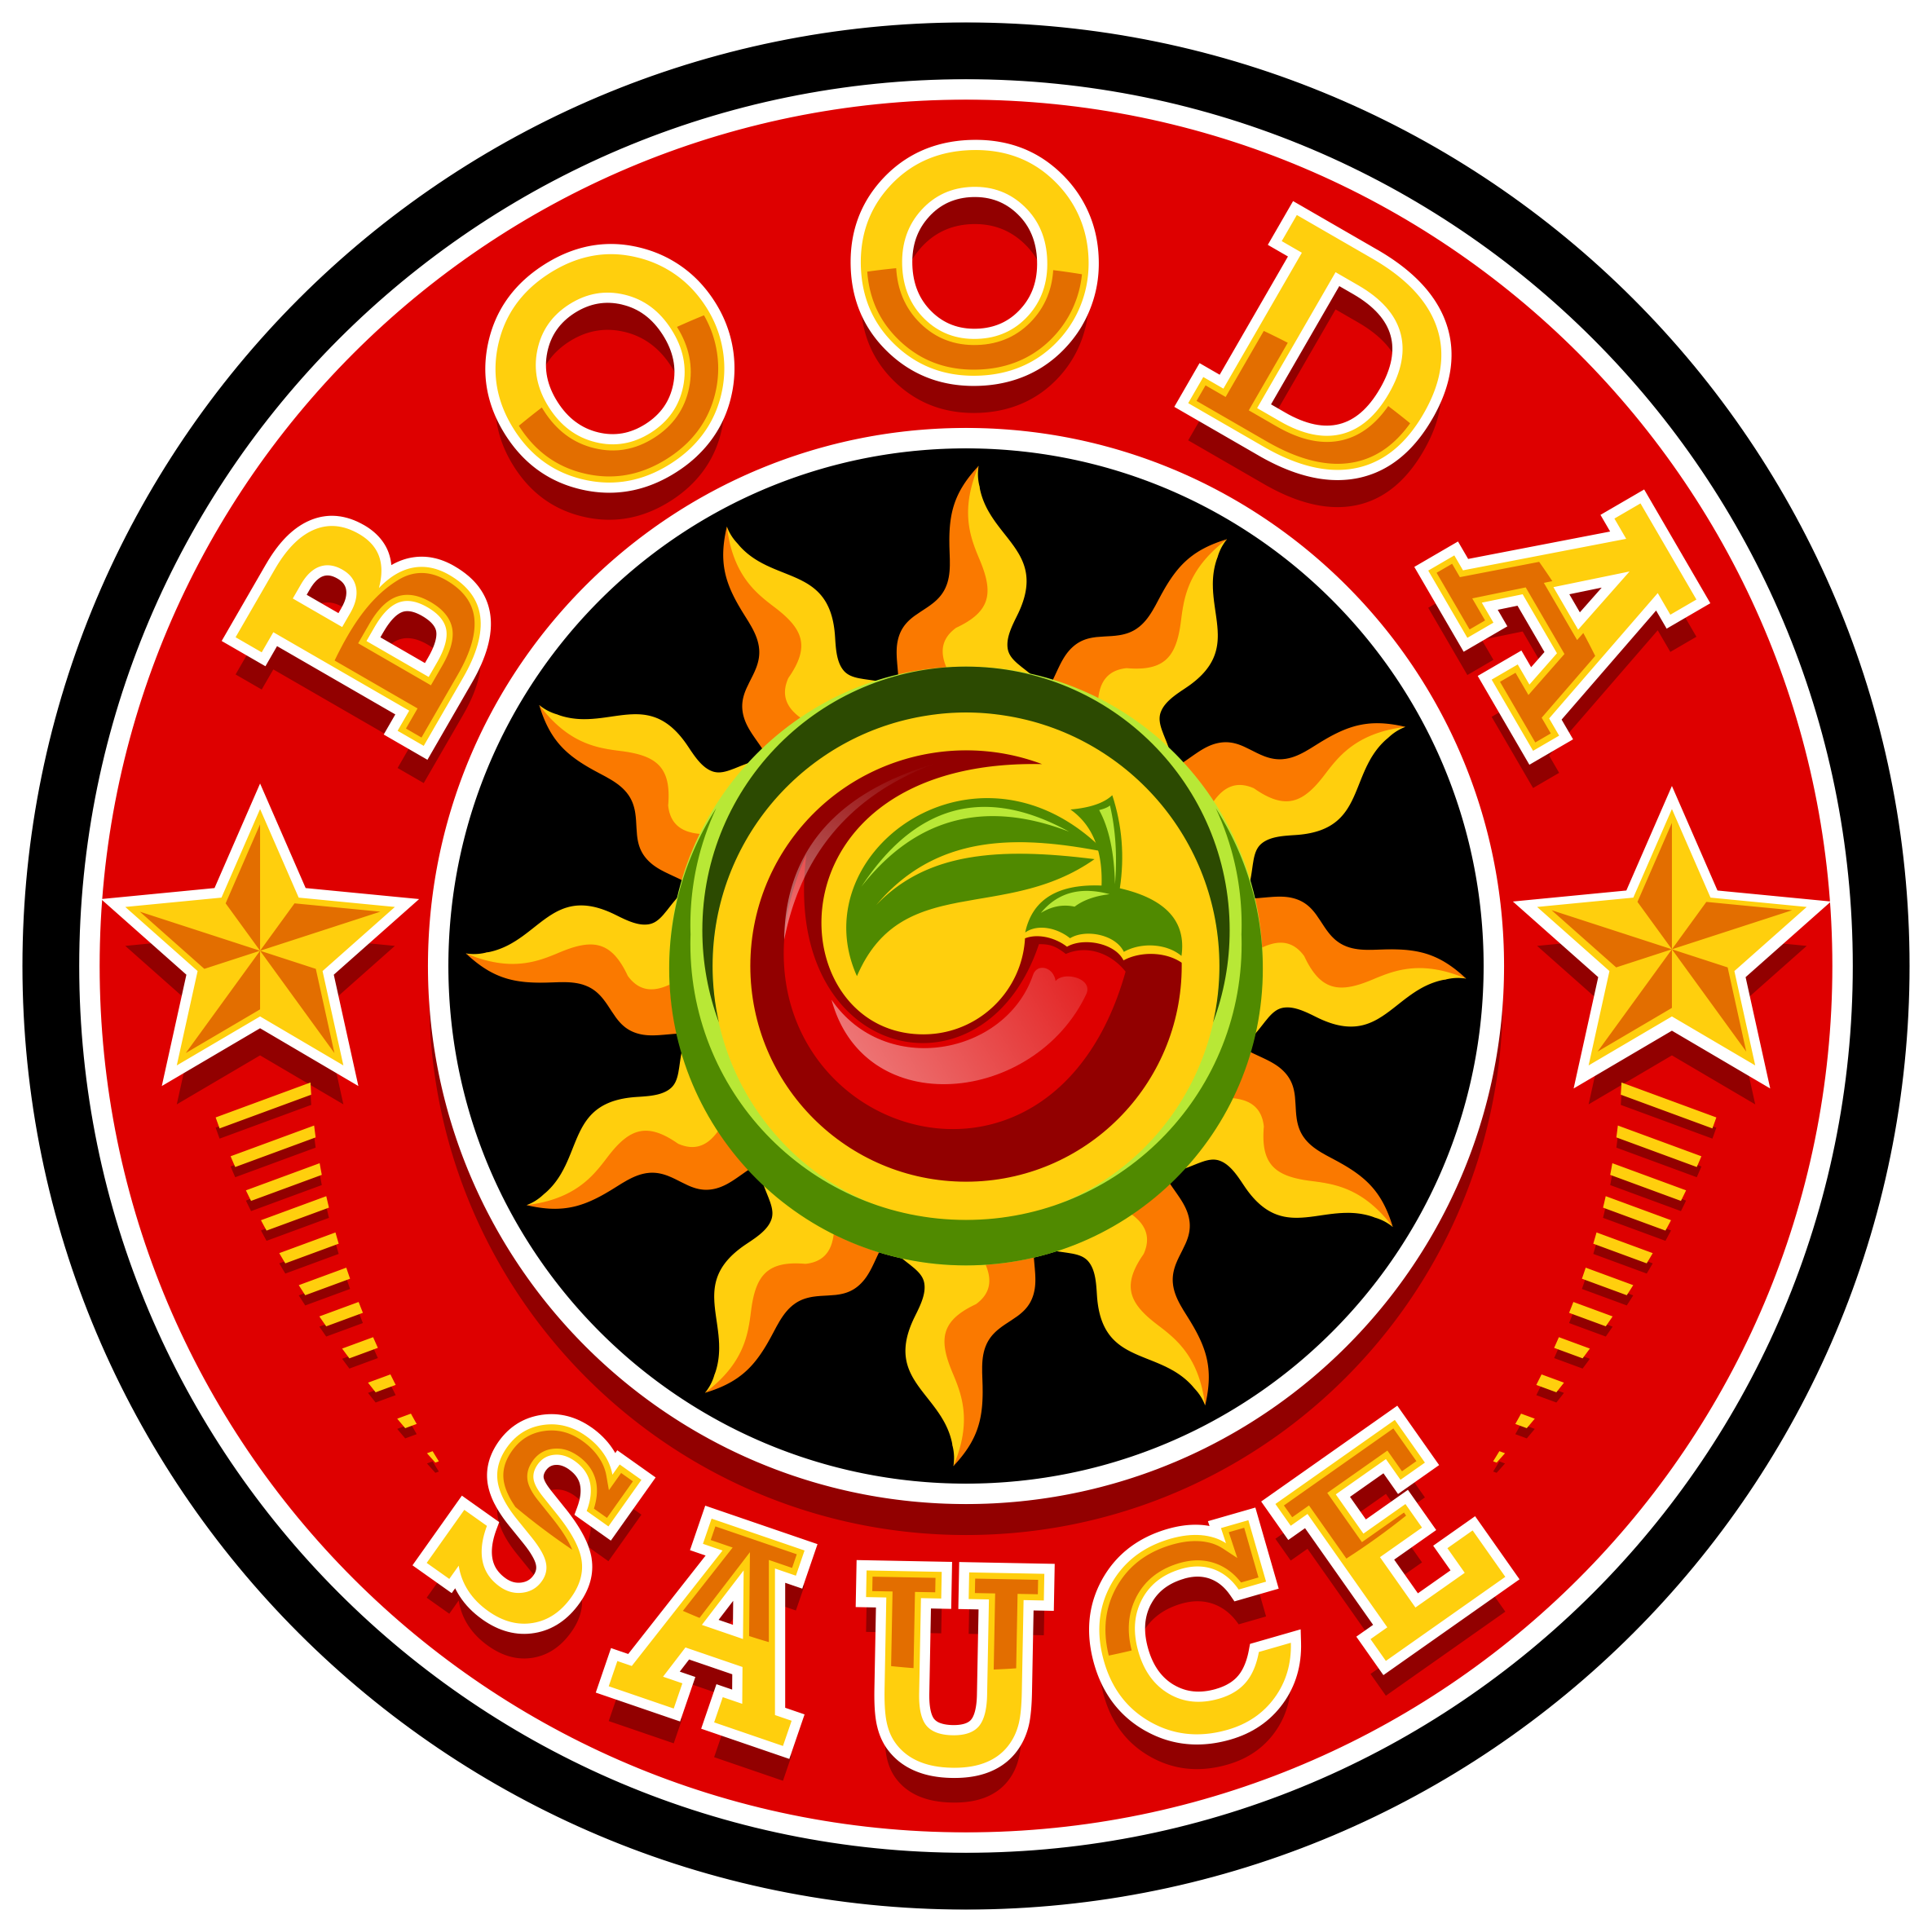 Booda Sauce & Booda Bowls needs a brand identity logo